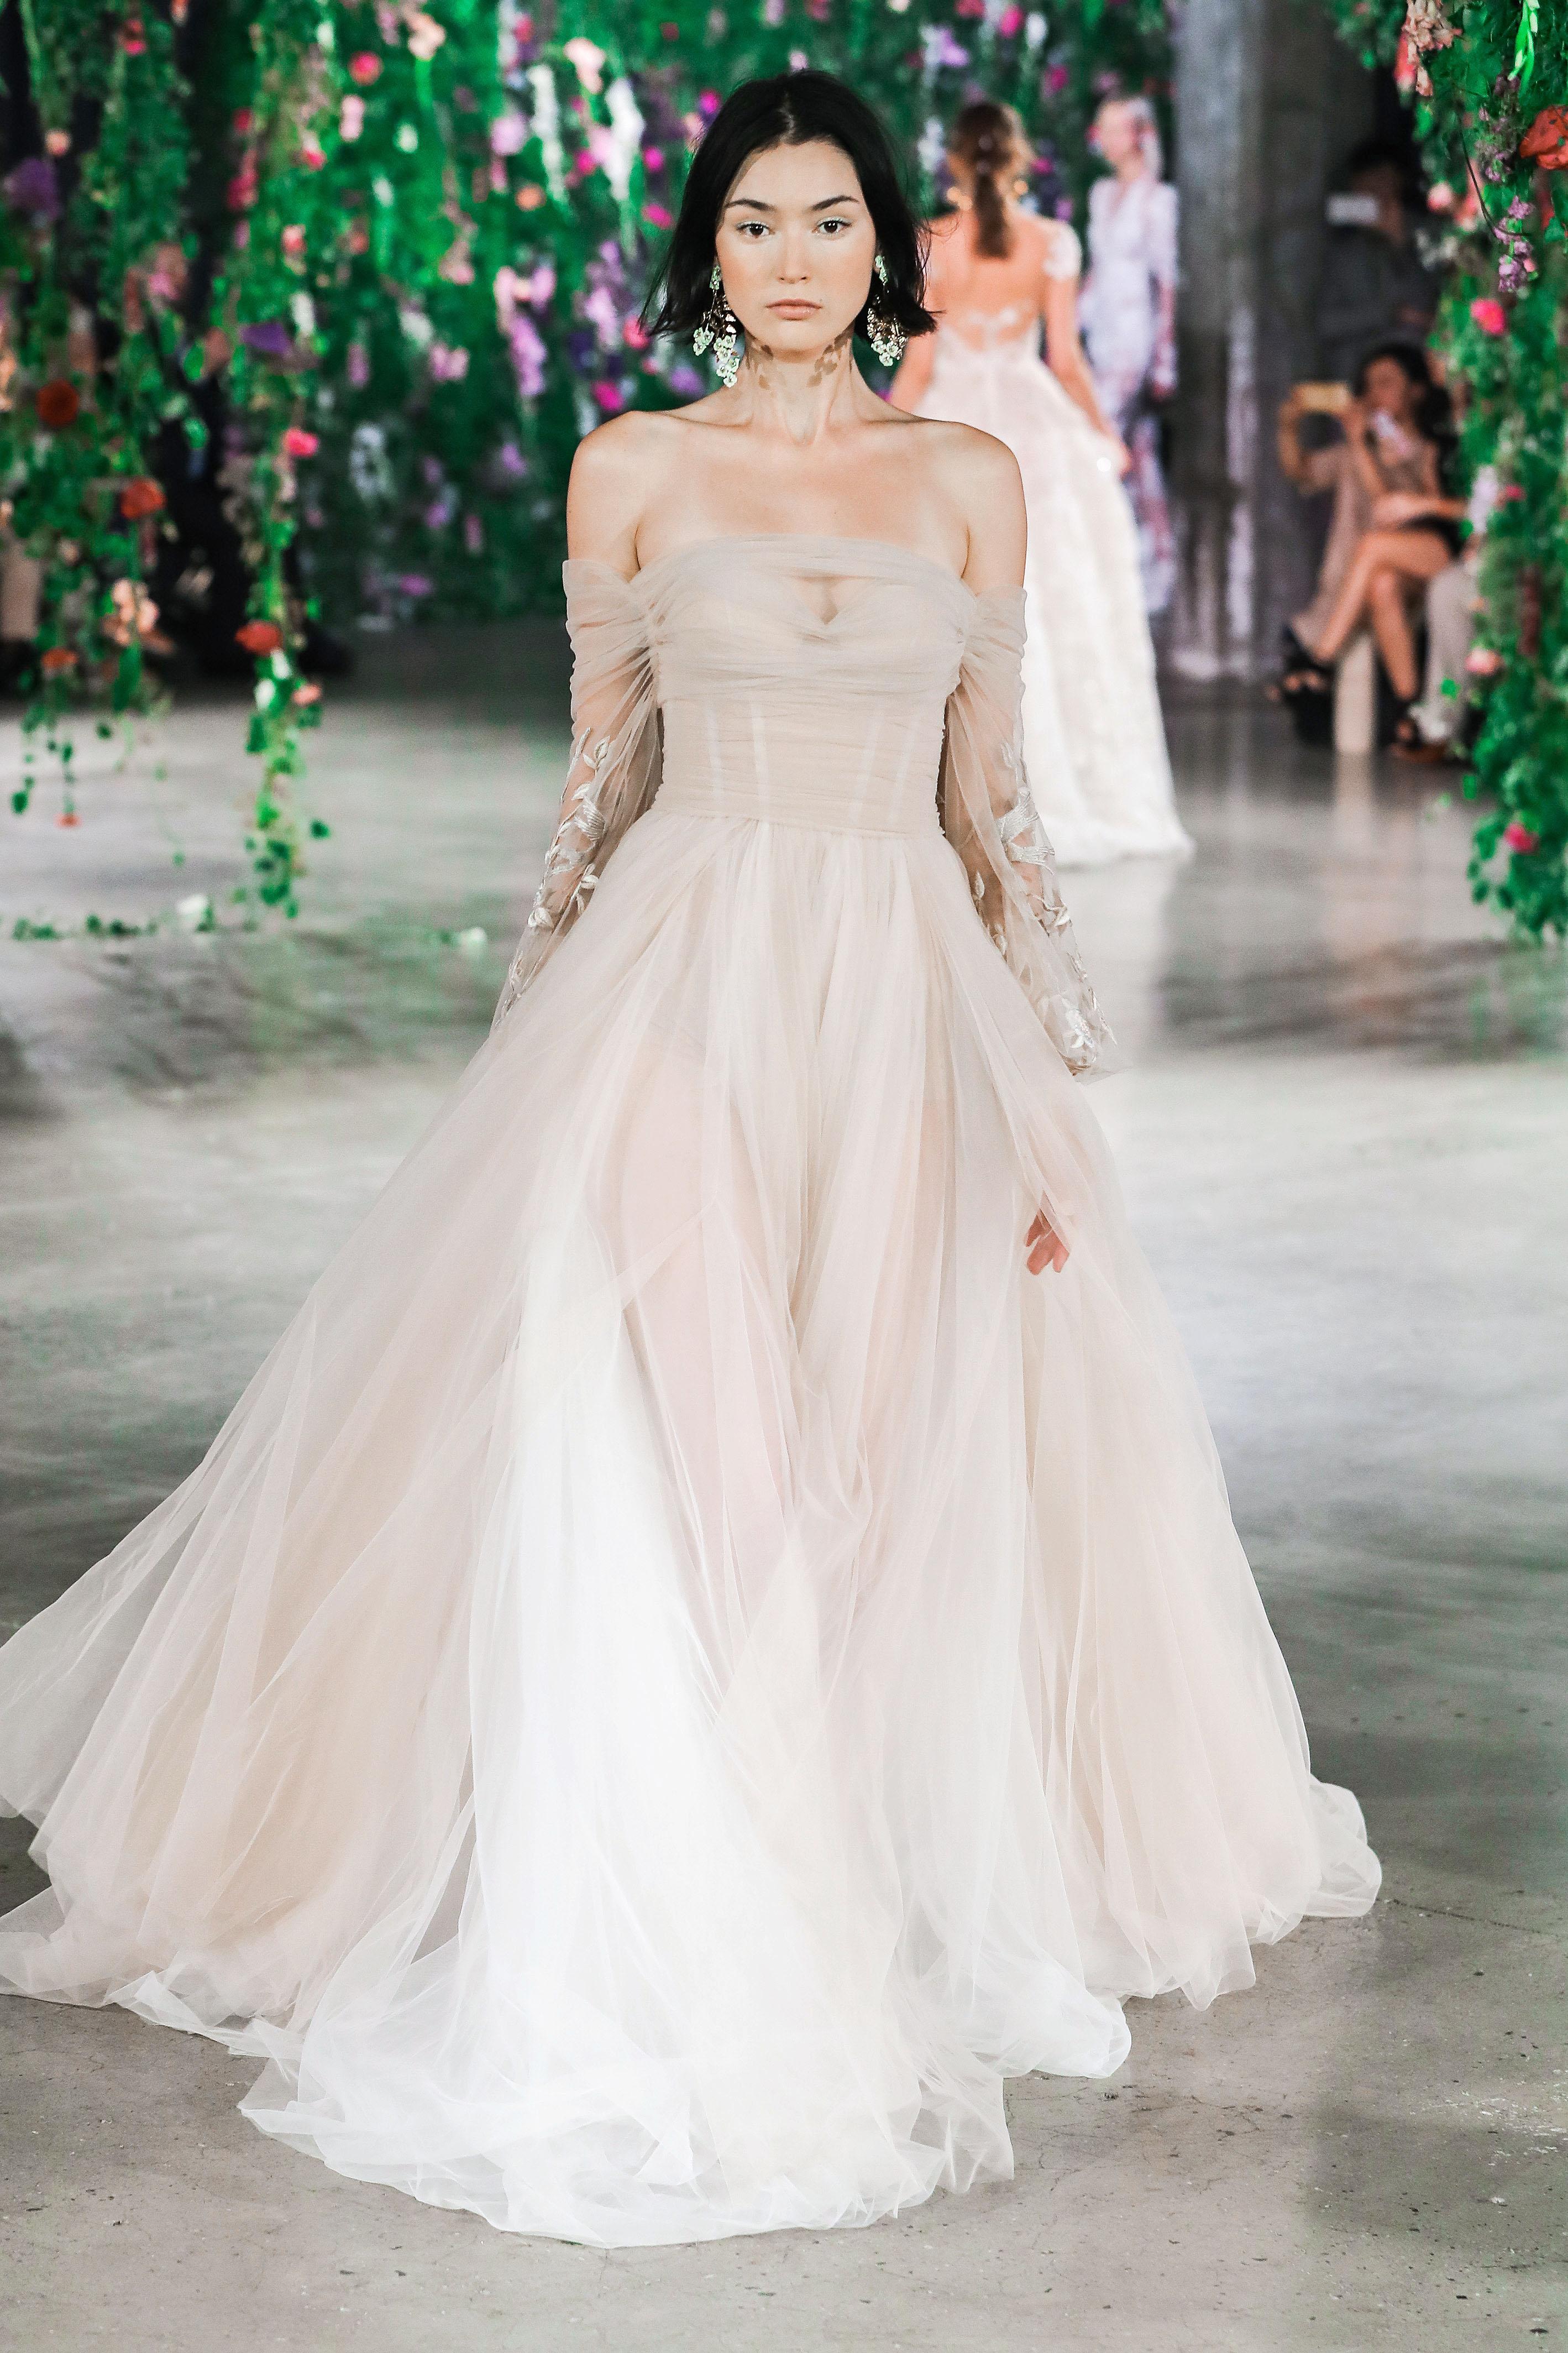 Galia Lahav Off-the-Shoulder with Long Sleeves Wedding Dress Fall 2018